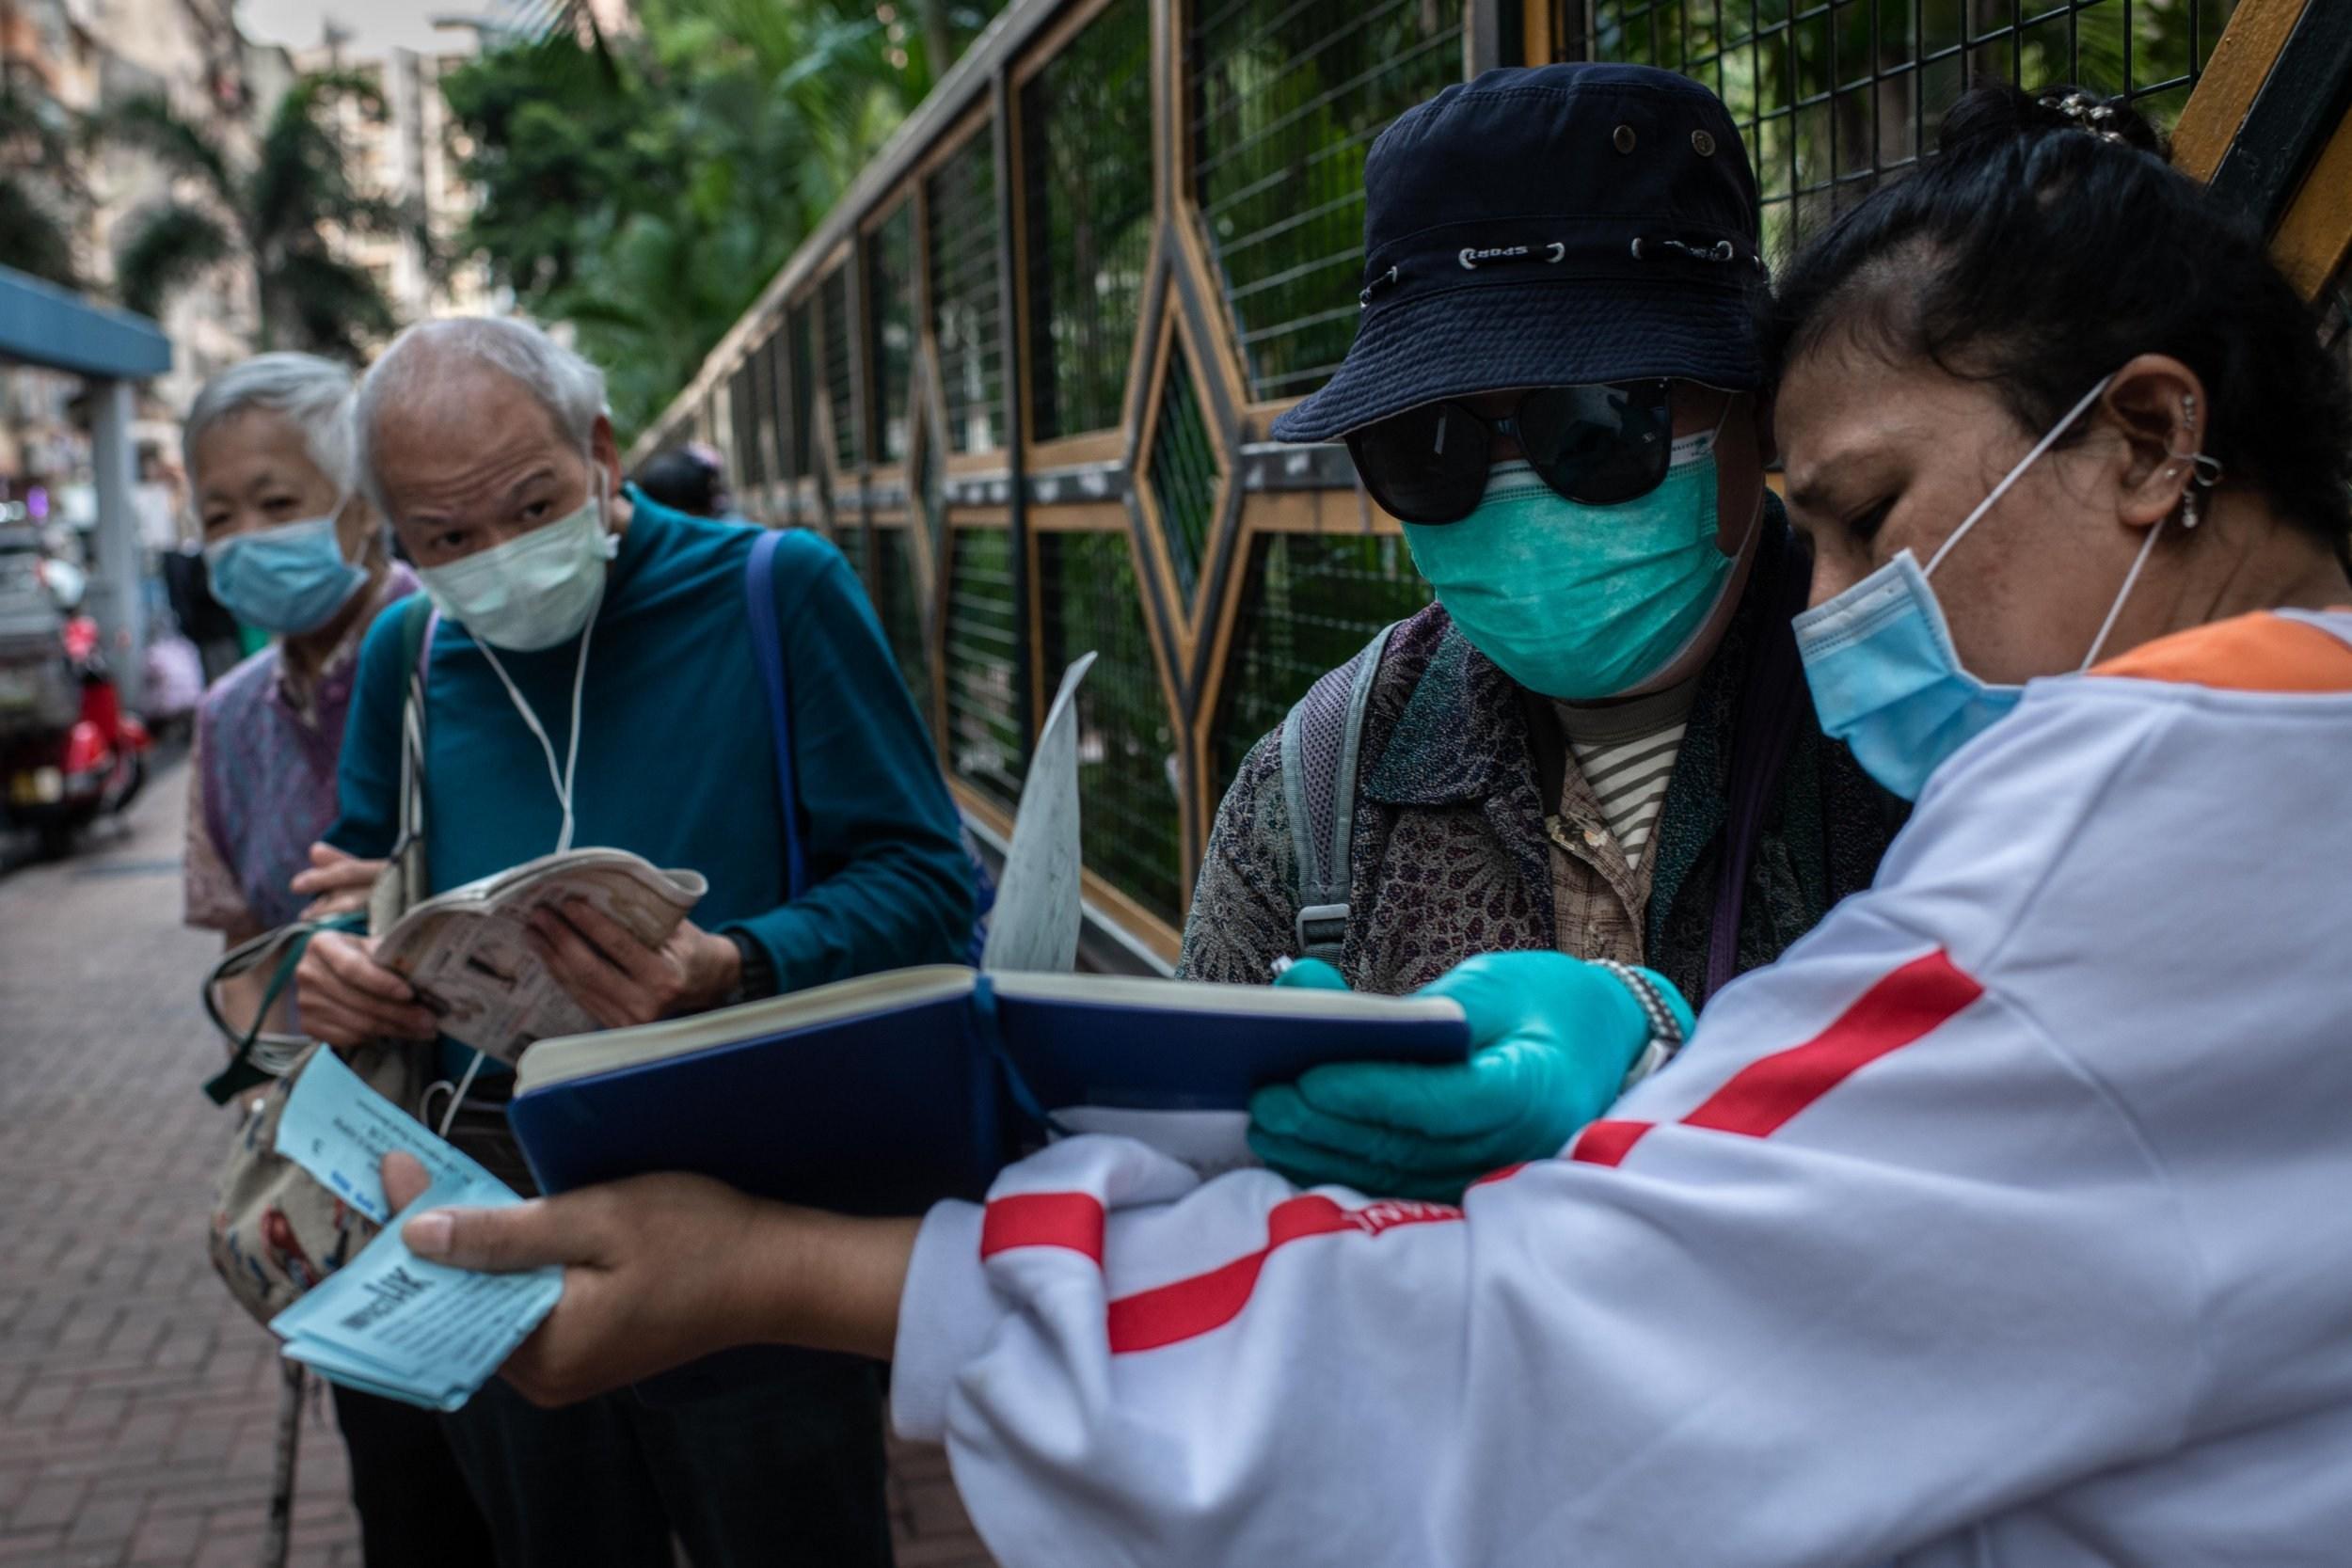 One in ten health workers catching coronavirus, WHO says